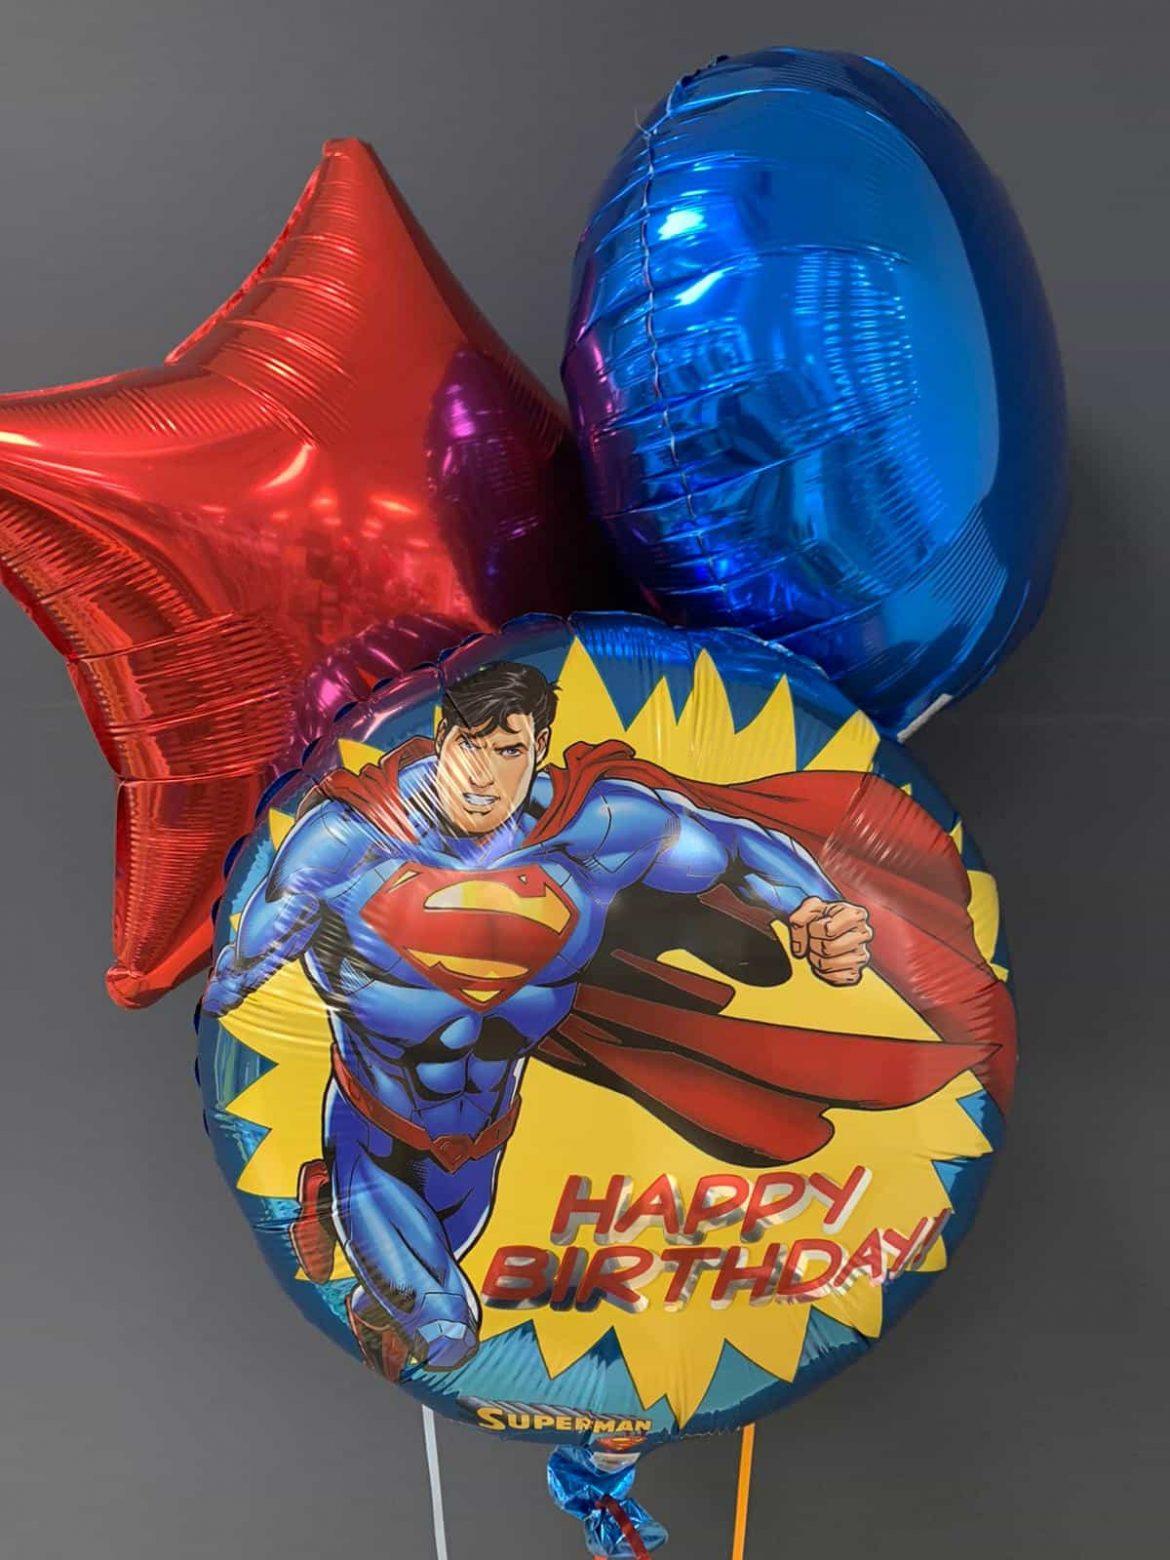 Superman Ballon<br />Happy Birthday € 5,50<br />Dekoballons € 4,50 1